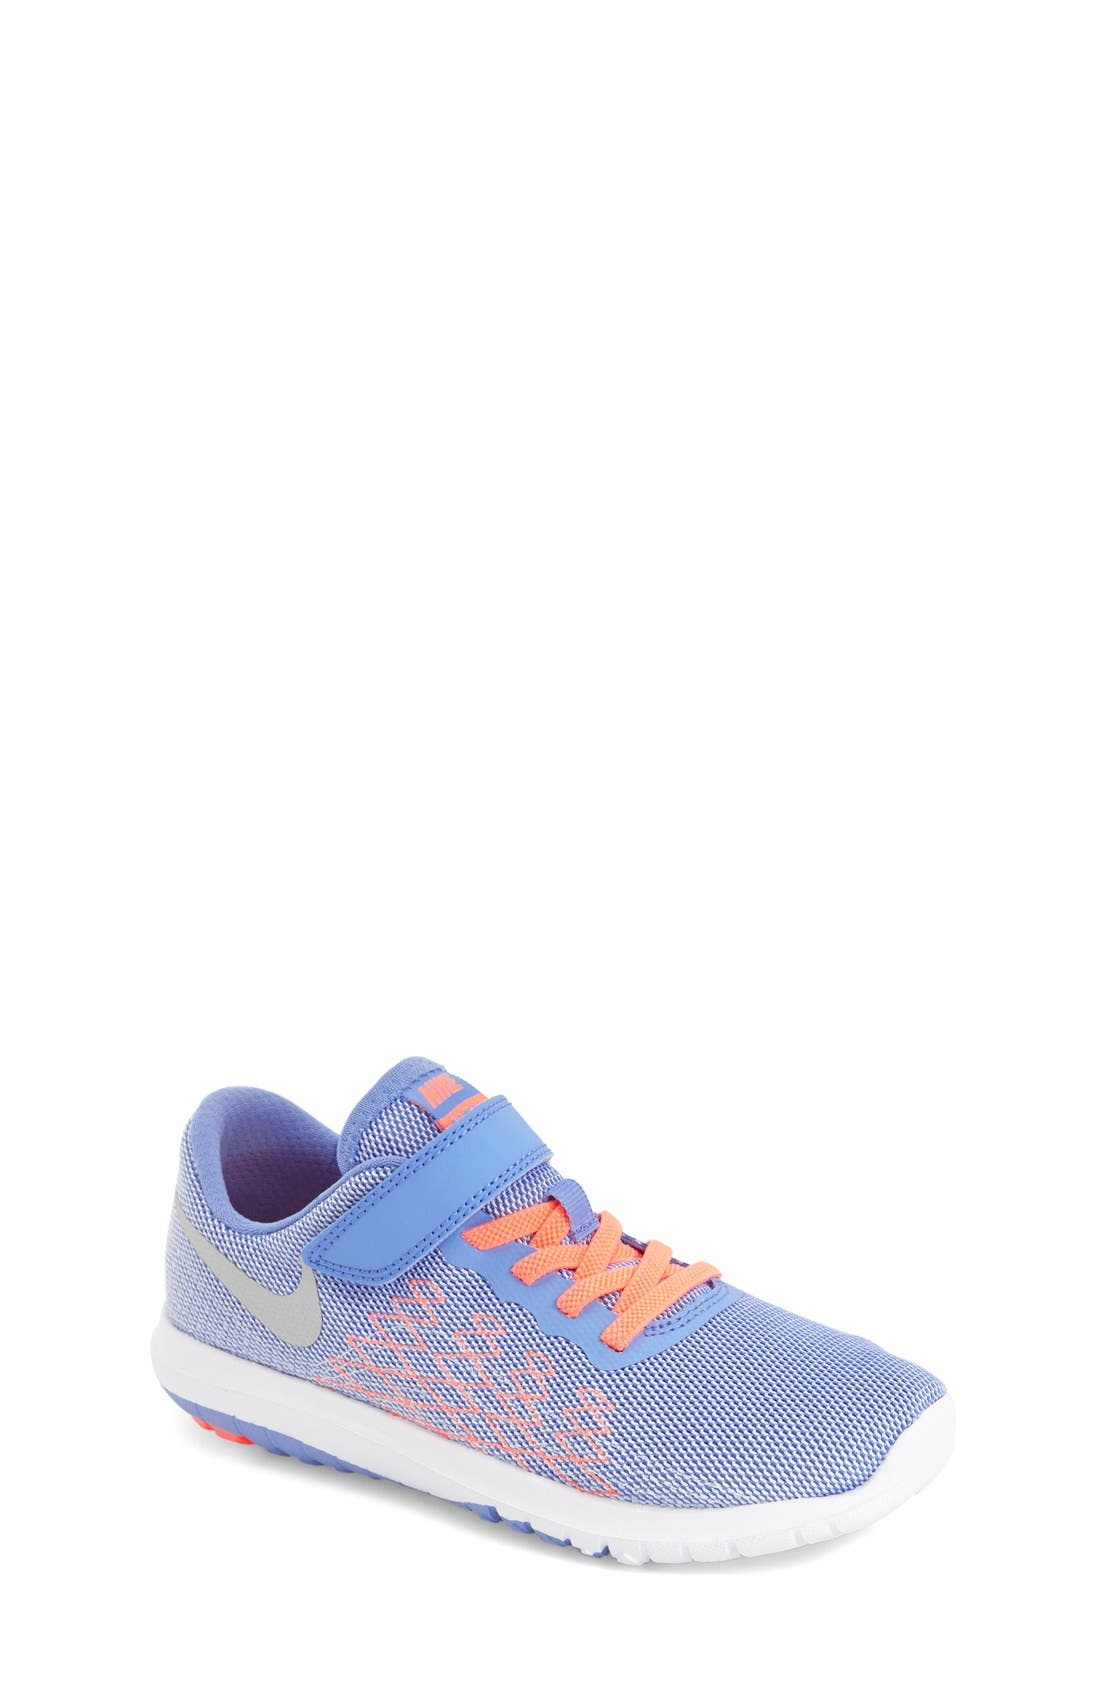 Main Image - Nike 'Flex Fury 2' Athletic Shoe (Toddler & Little Kid)